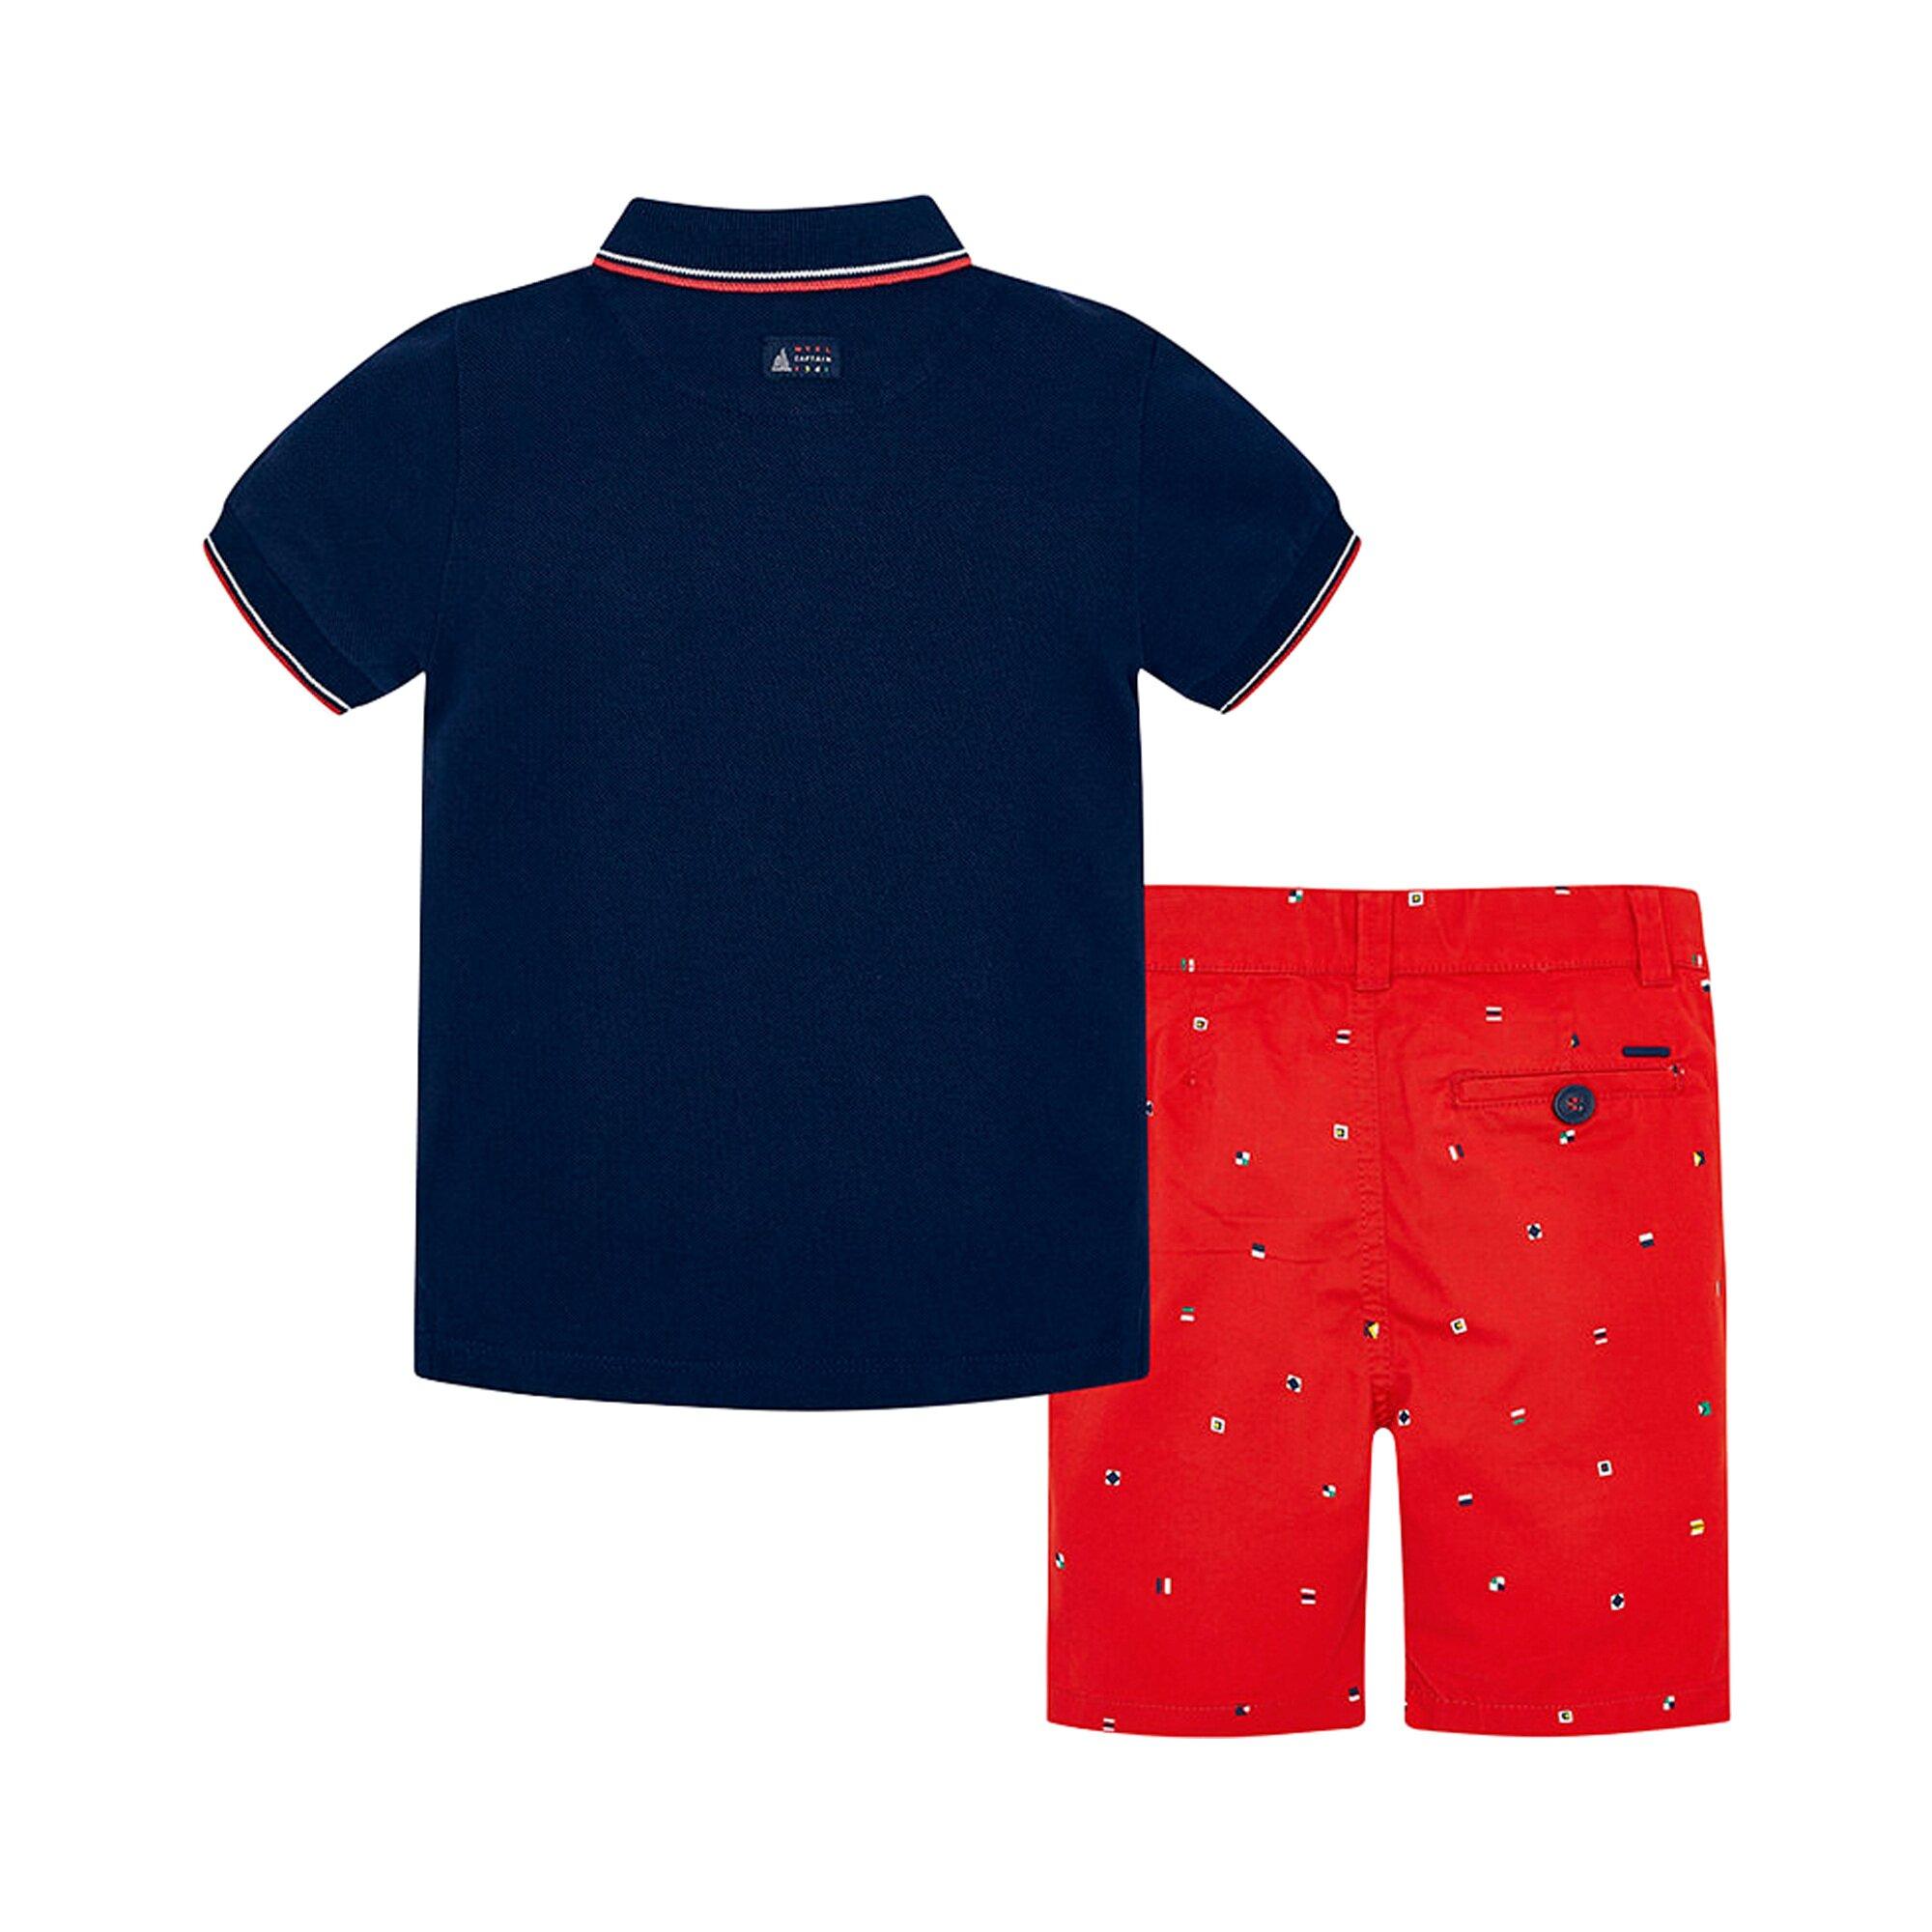 mayoral-2-tlg-set-poloshirt-kurzarm-und-shorts